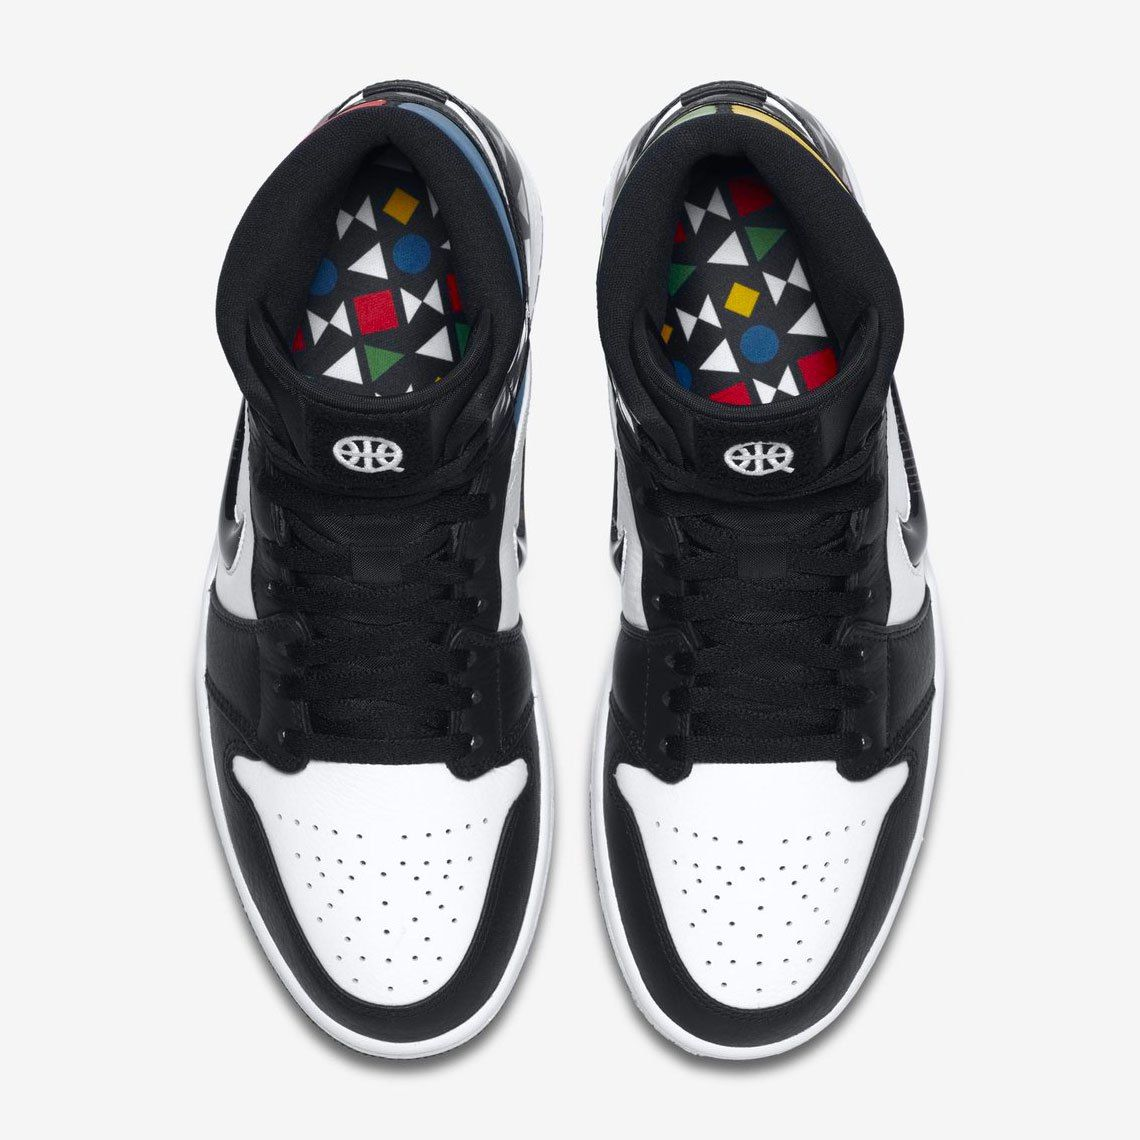 Air Jordan 1 Mid Quai 54 2019 Release